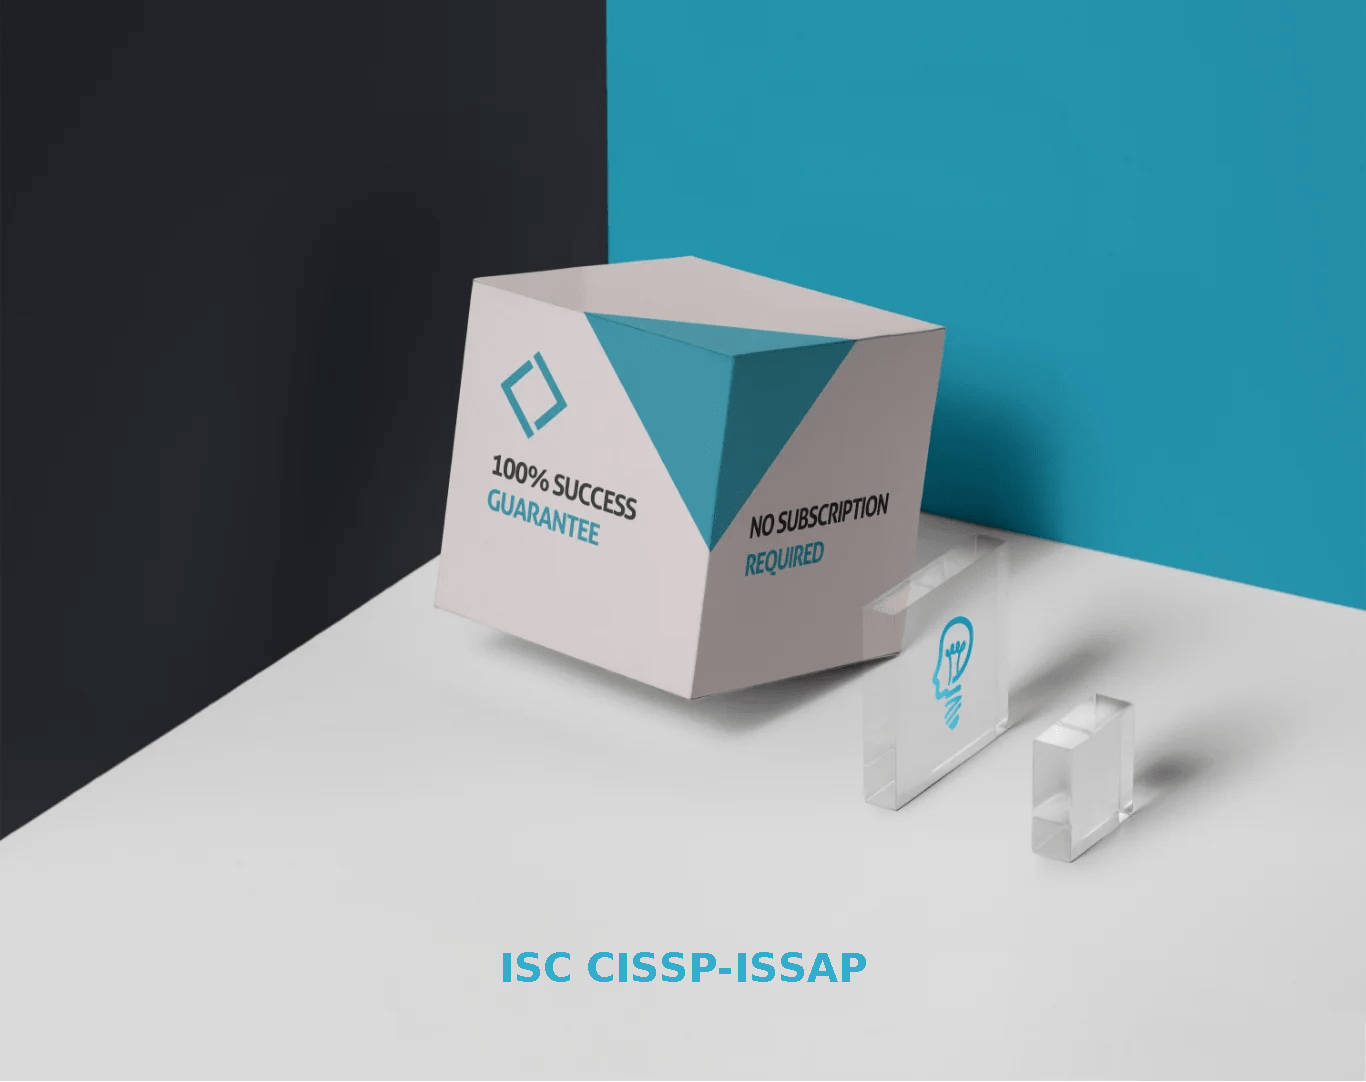 ISC CISSP-ISSAP Exams